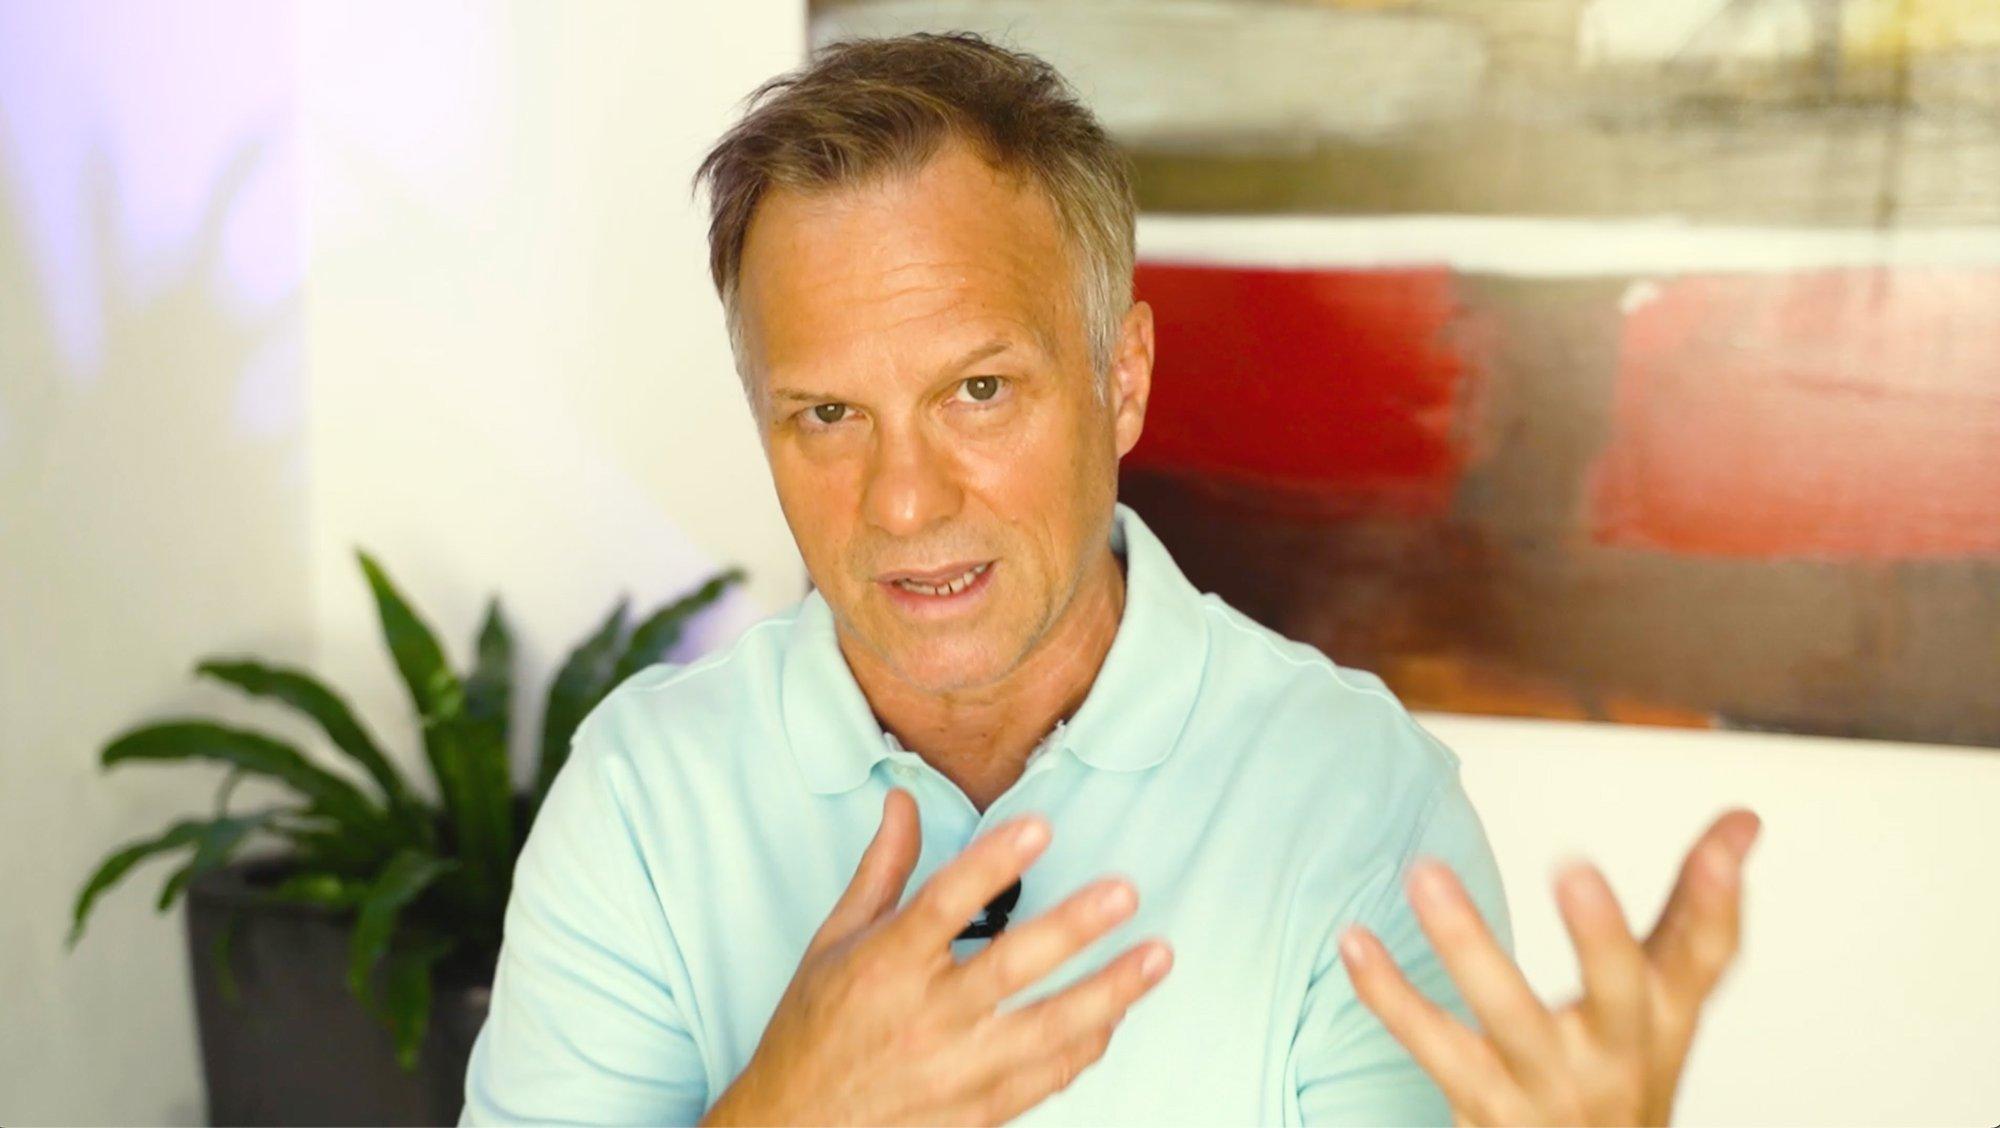 Michael Taylor marketing growth advisor